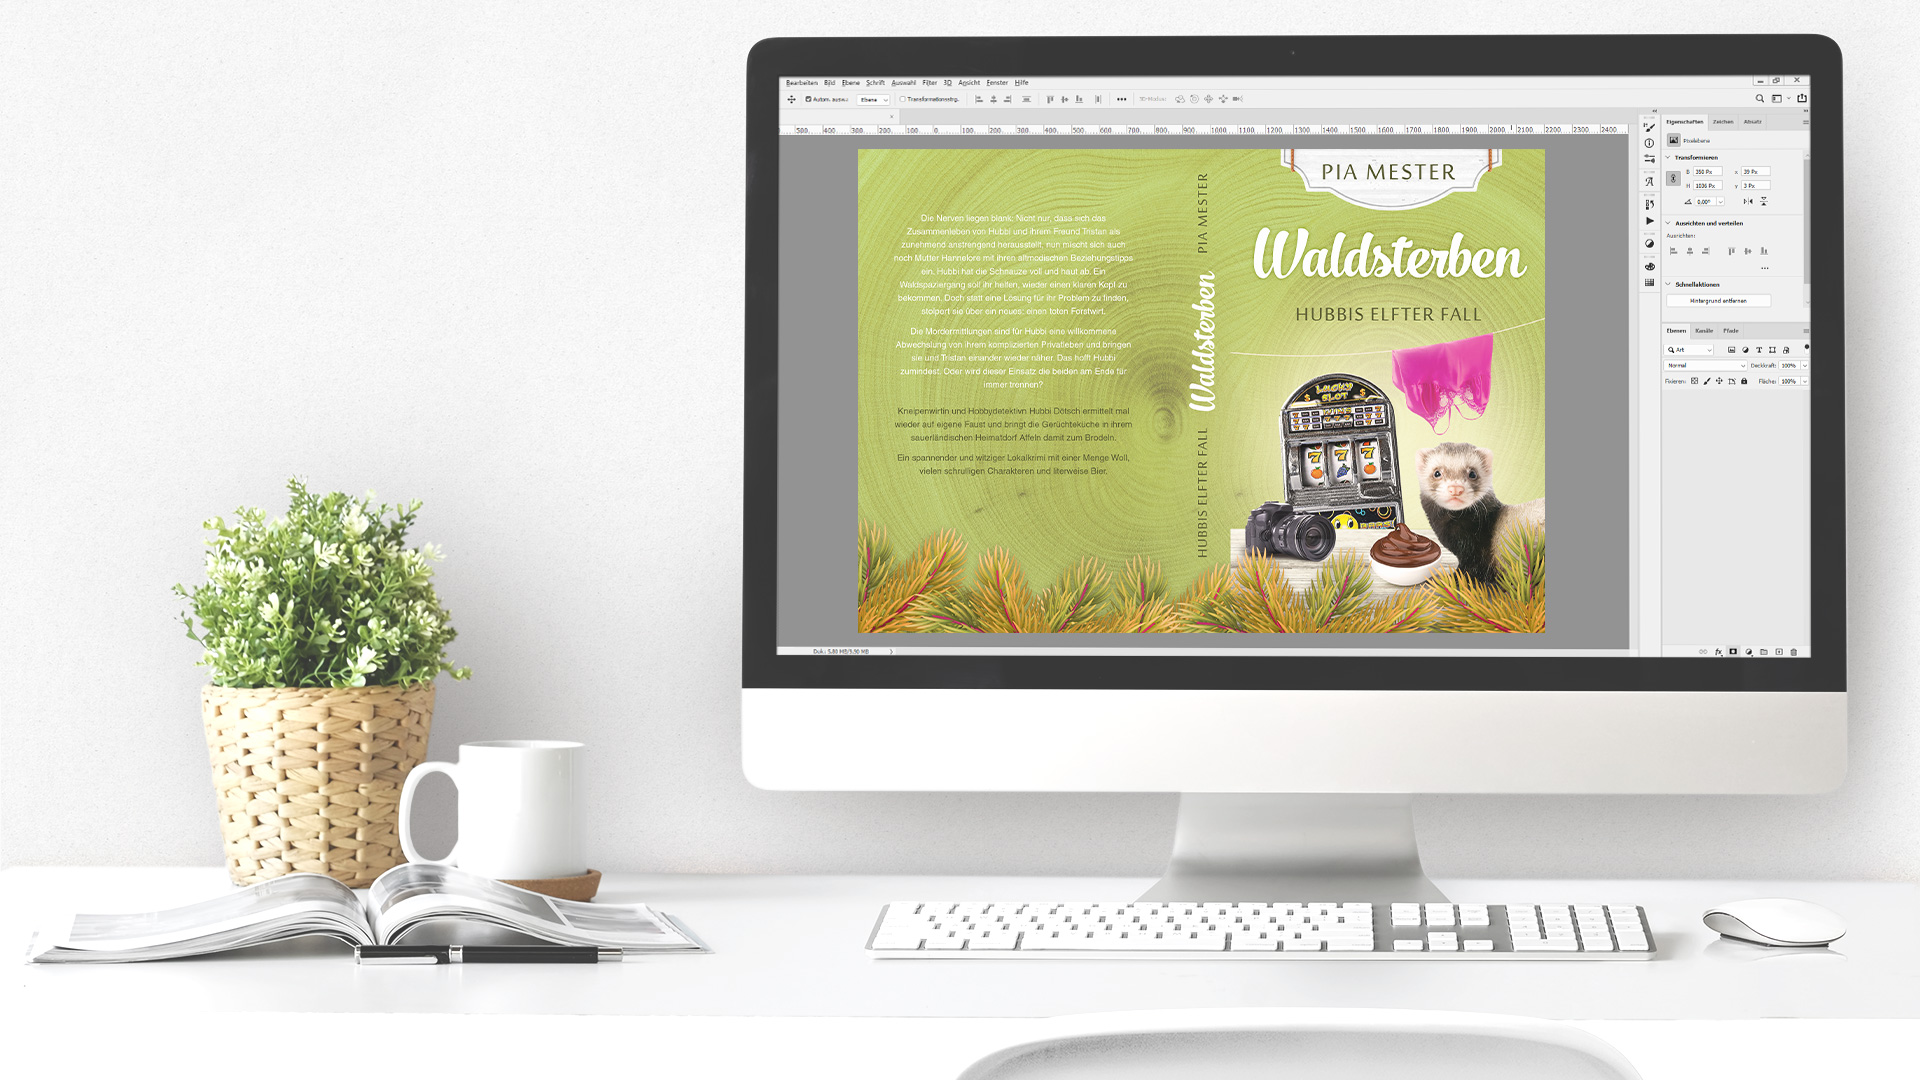 Waldsterben Cover